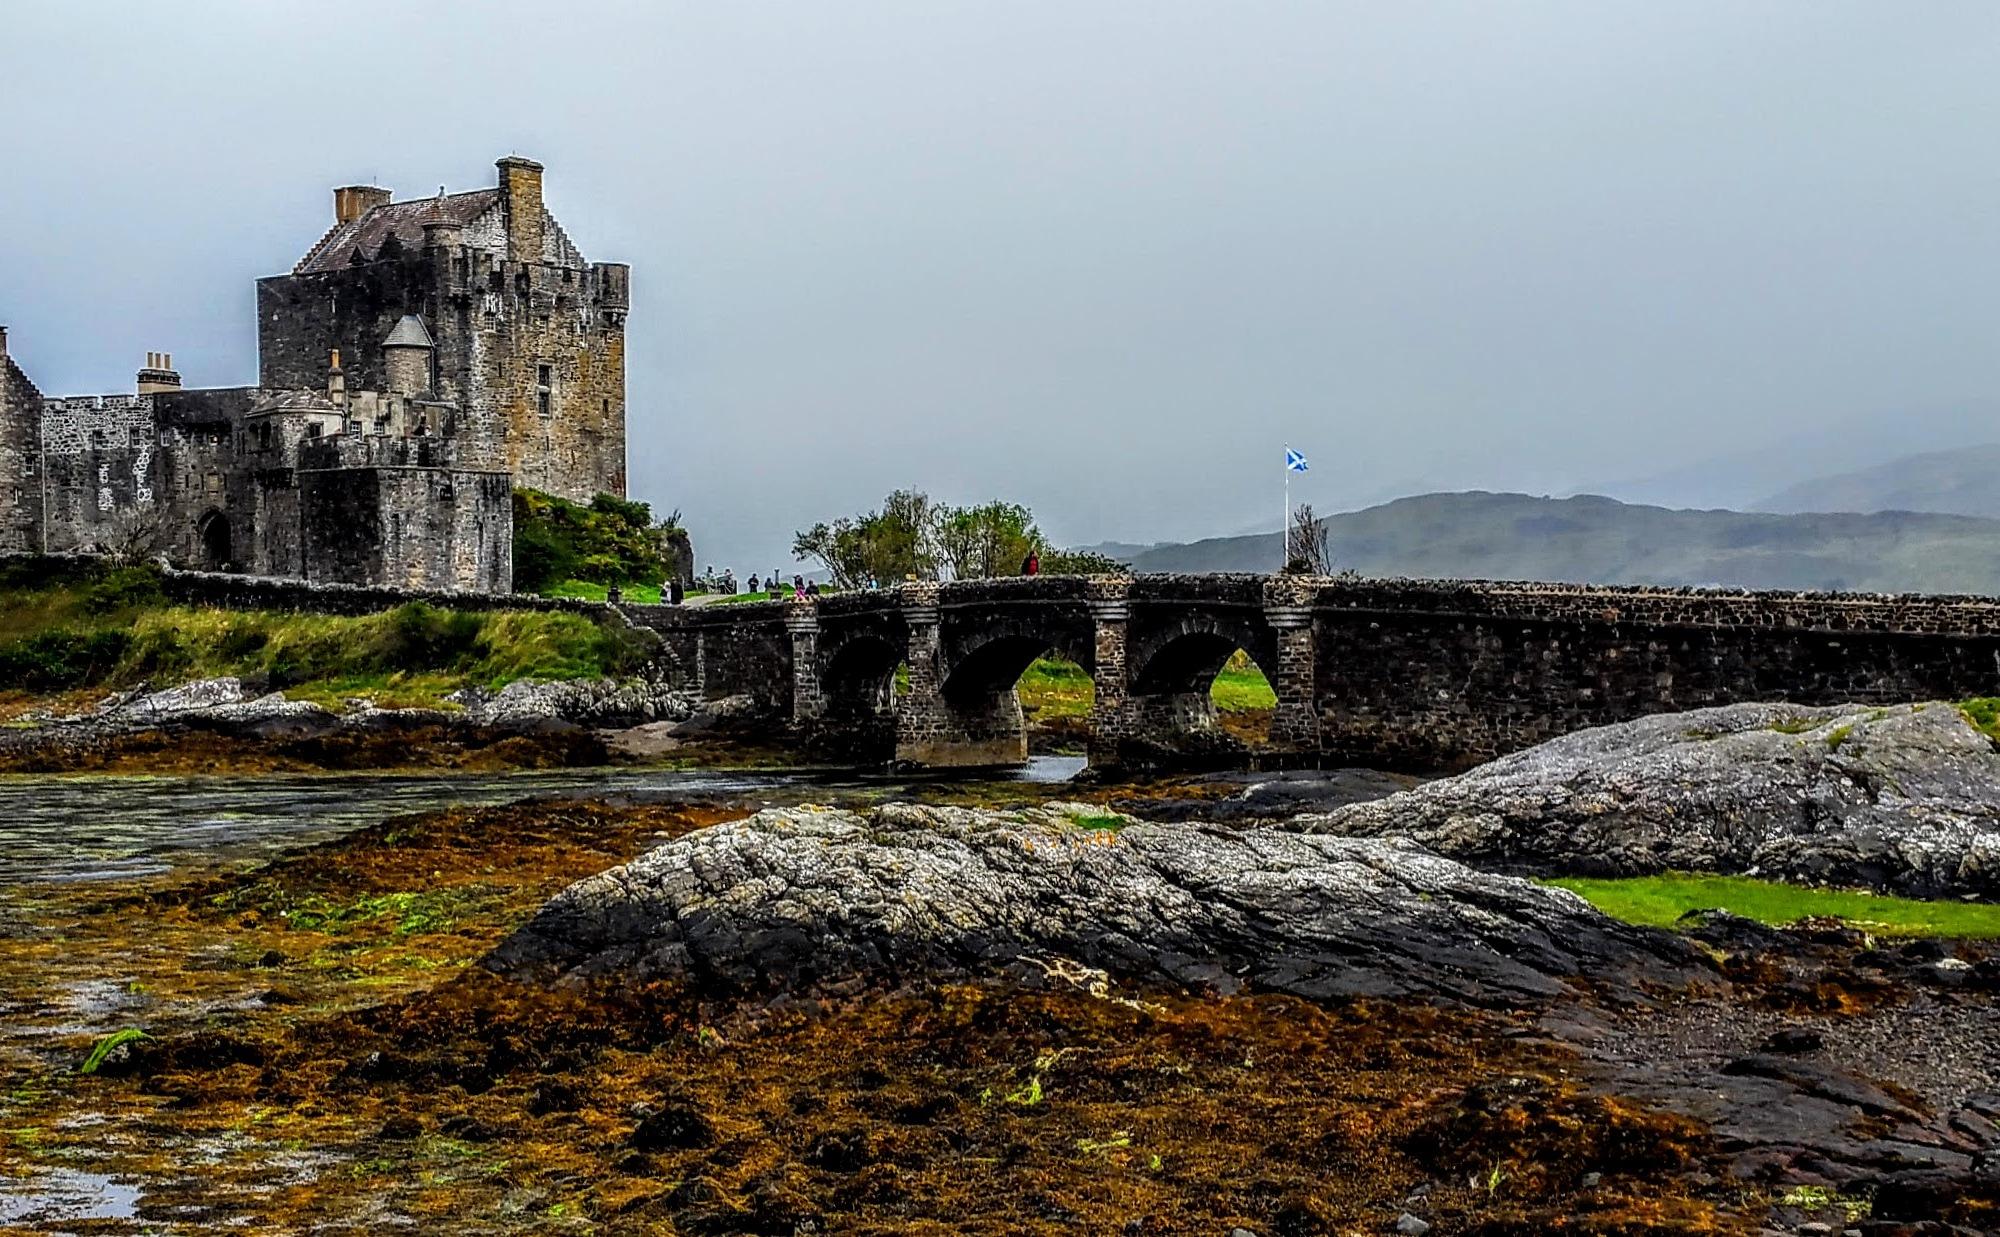 British Isles – England, Scotland, Ireland 10 day, 9 night